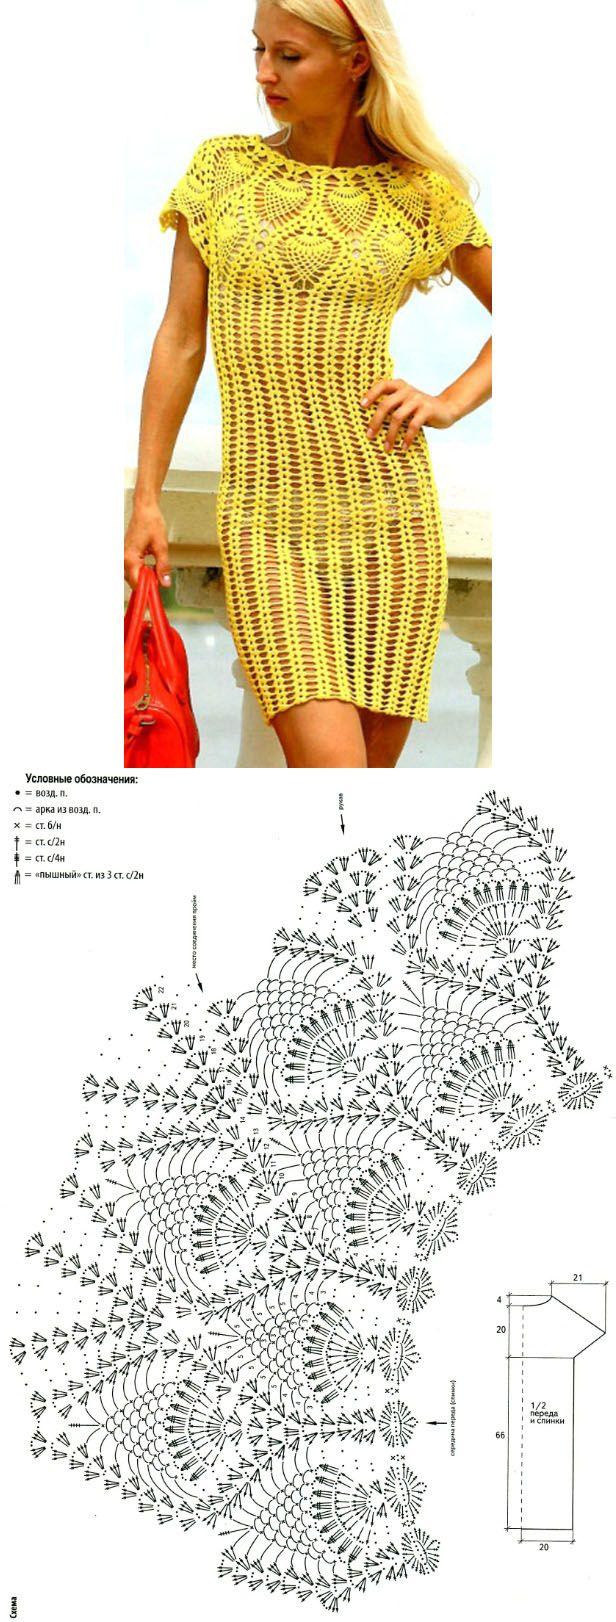 826 Best Images About Crochet Patterns Diagrams